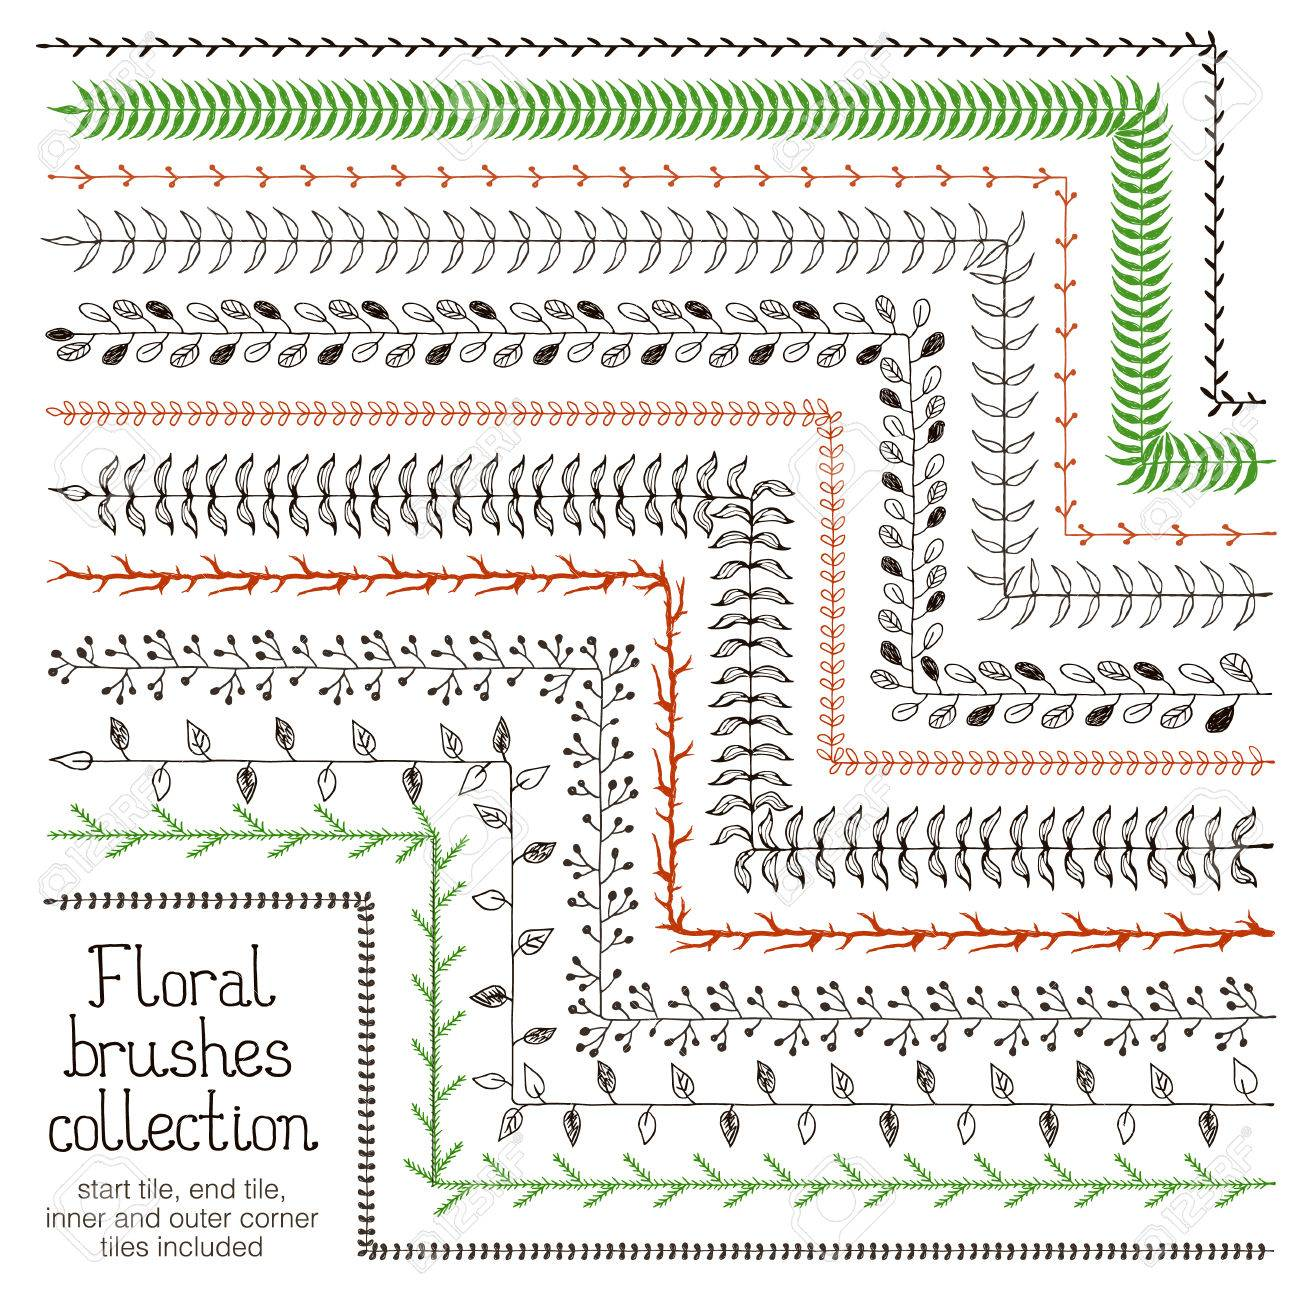 Floral Brushes For Illustrator. Hand Drawn Vector Brushes For ...